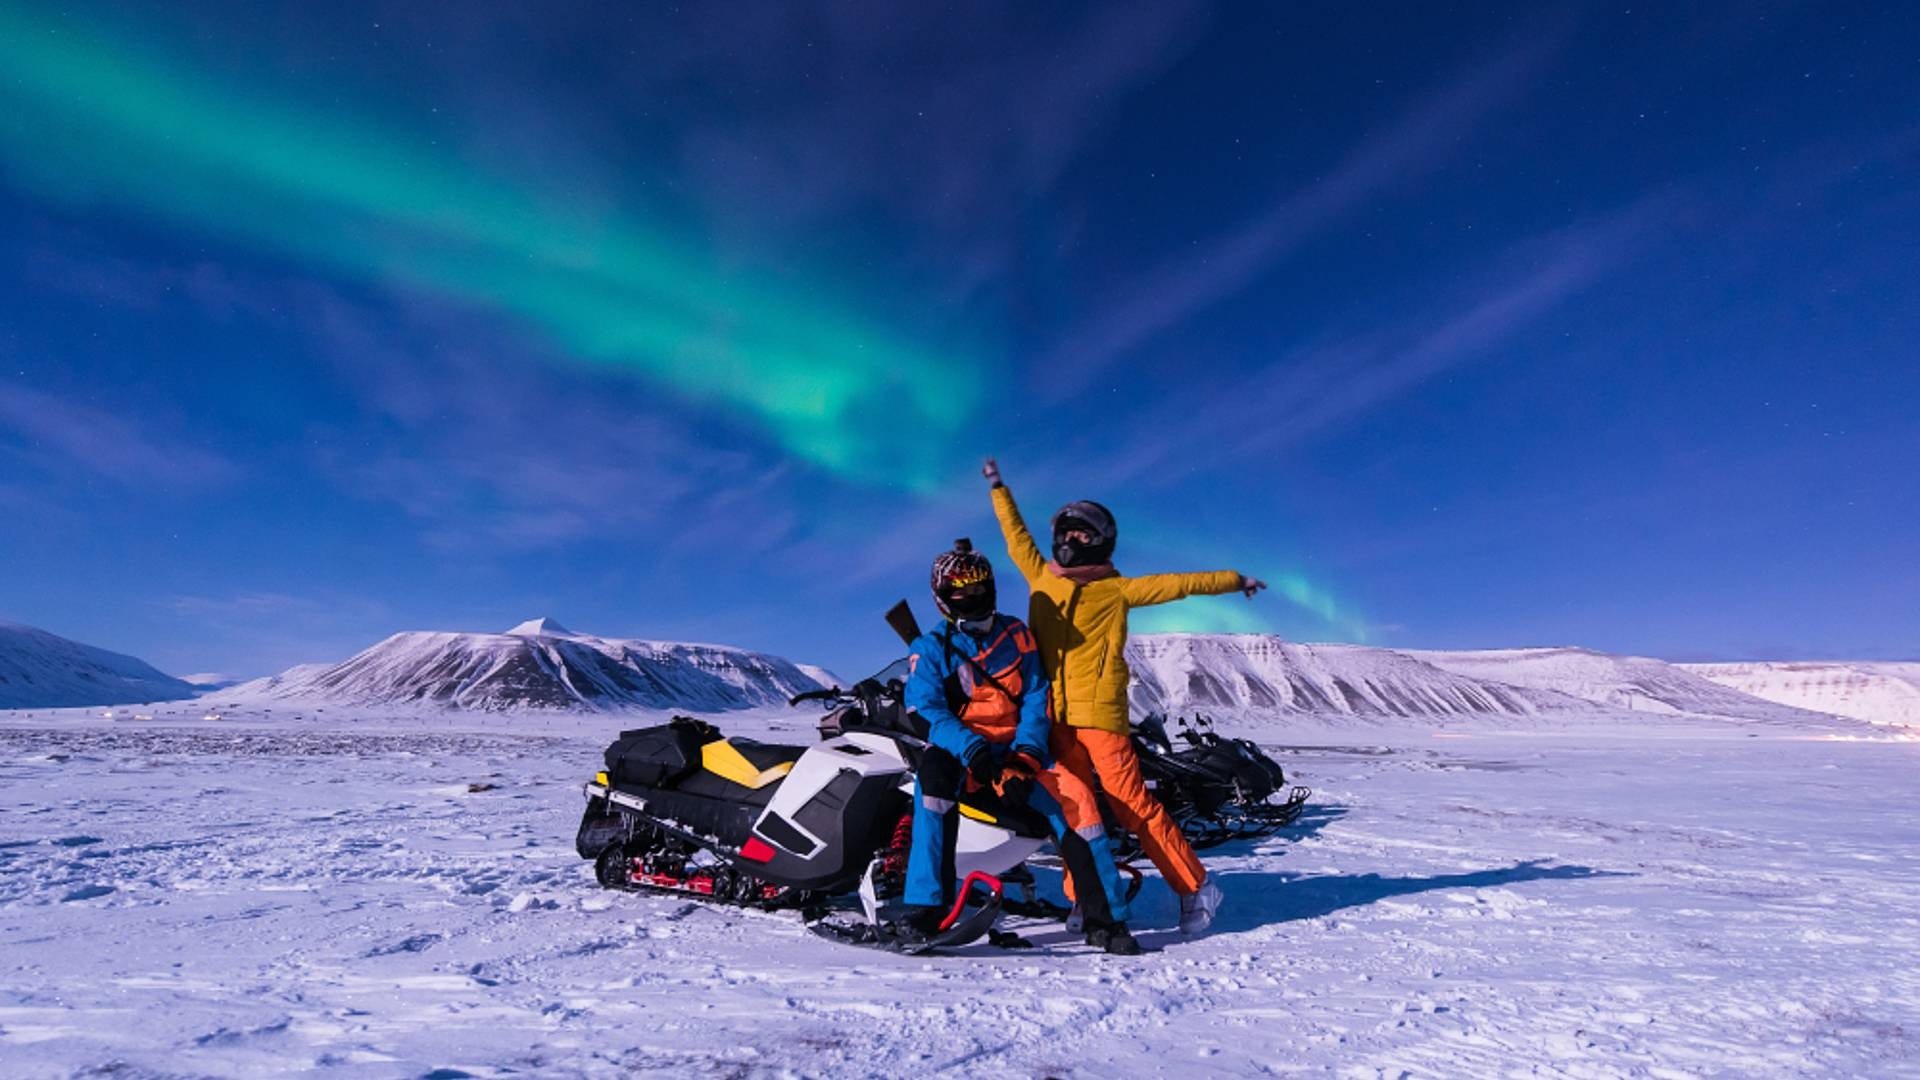 Aventura ártica en Tromso